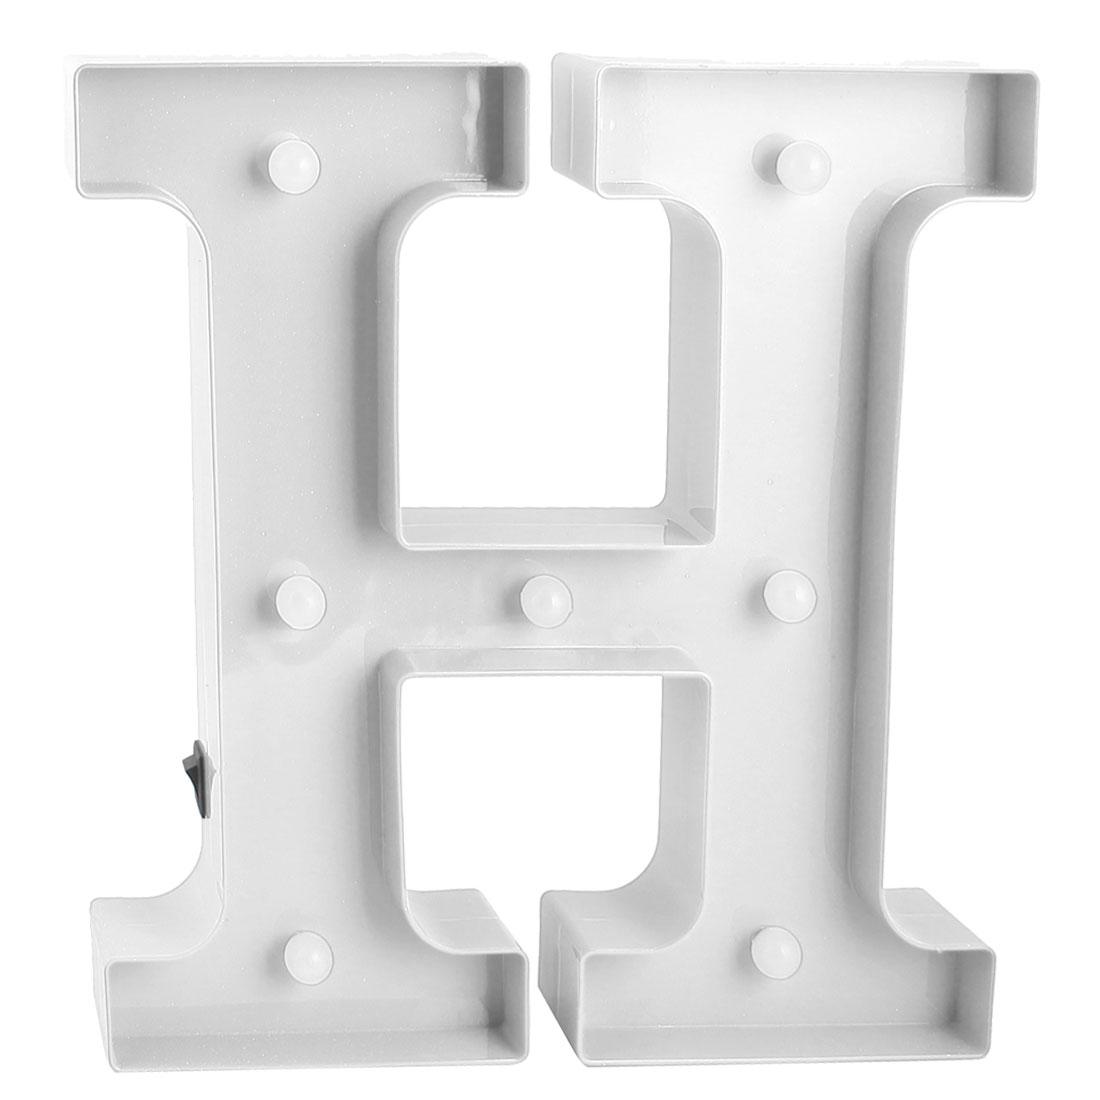 Party Plastic Decor English H Letter Alphabet Word Free DIY Hanging LED Light White